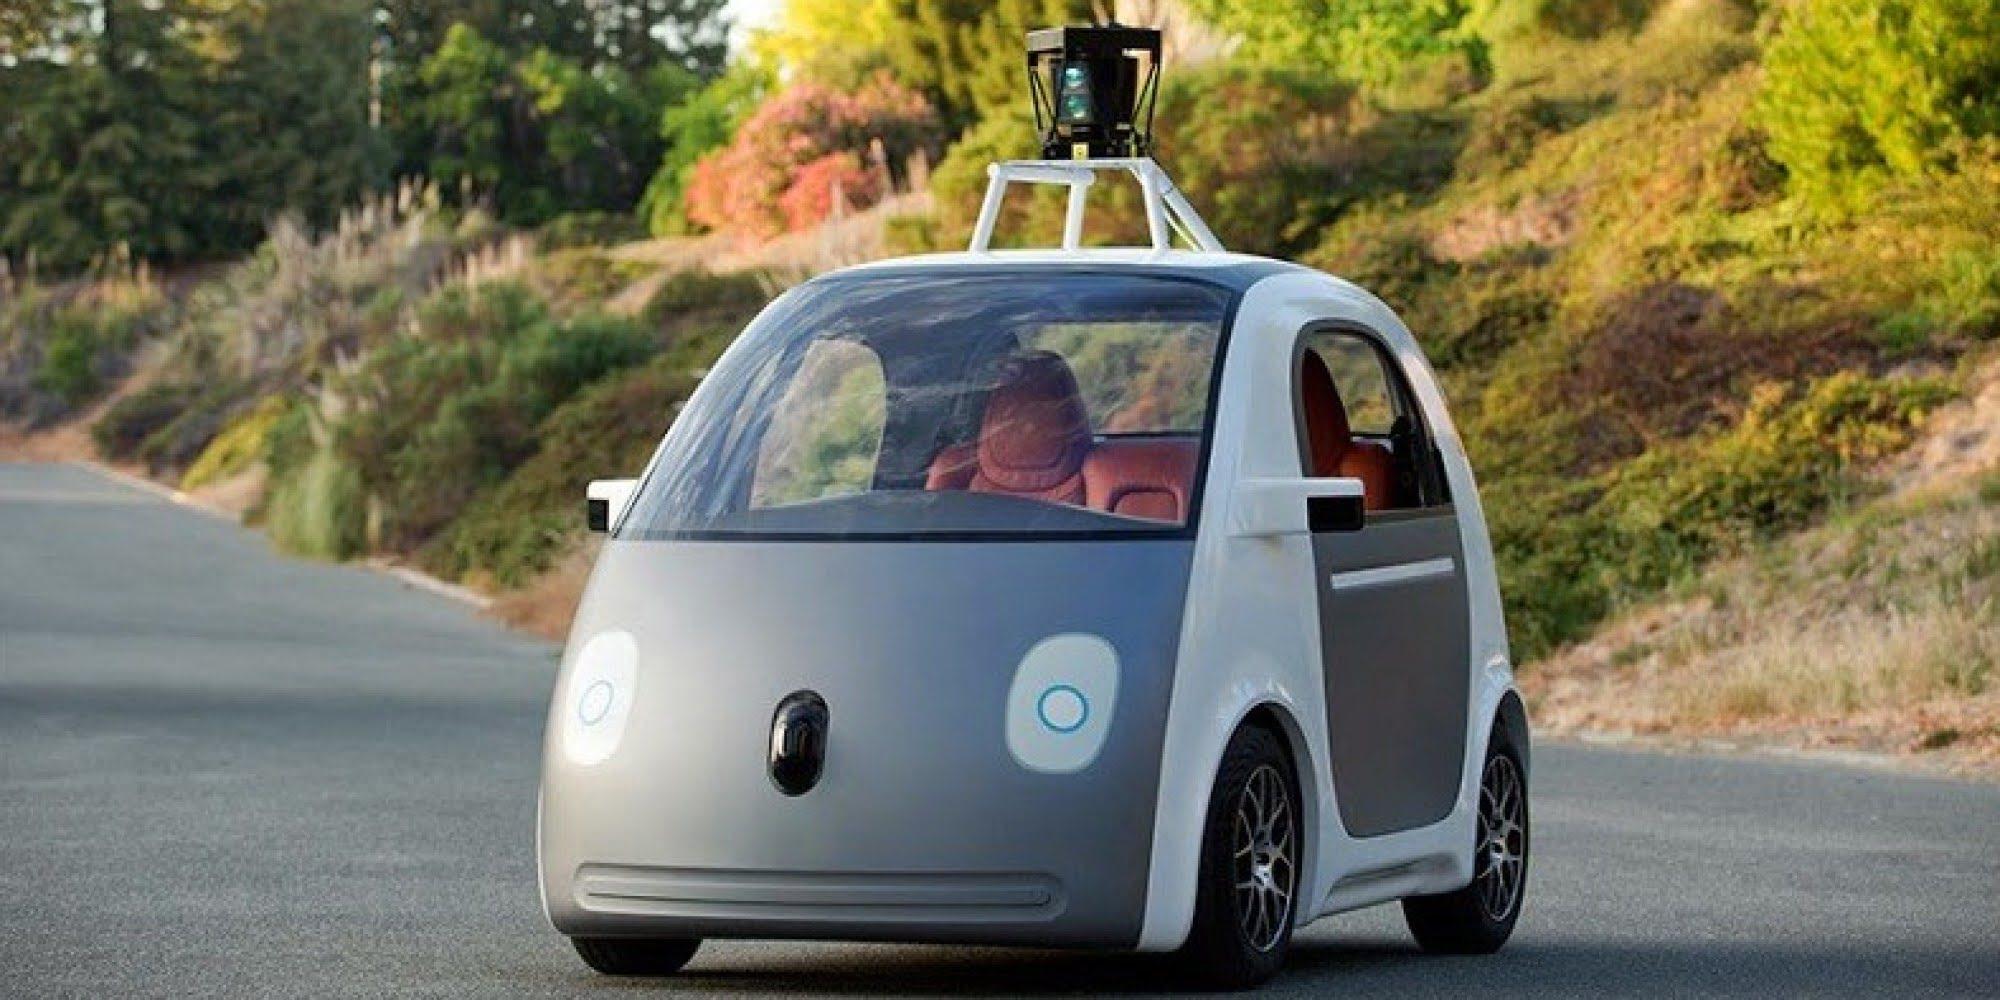 Google's 'Driverless Car' Launches in Saudi Arabia - The Mideast Beast